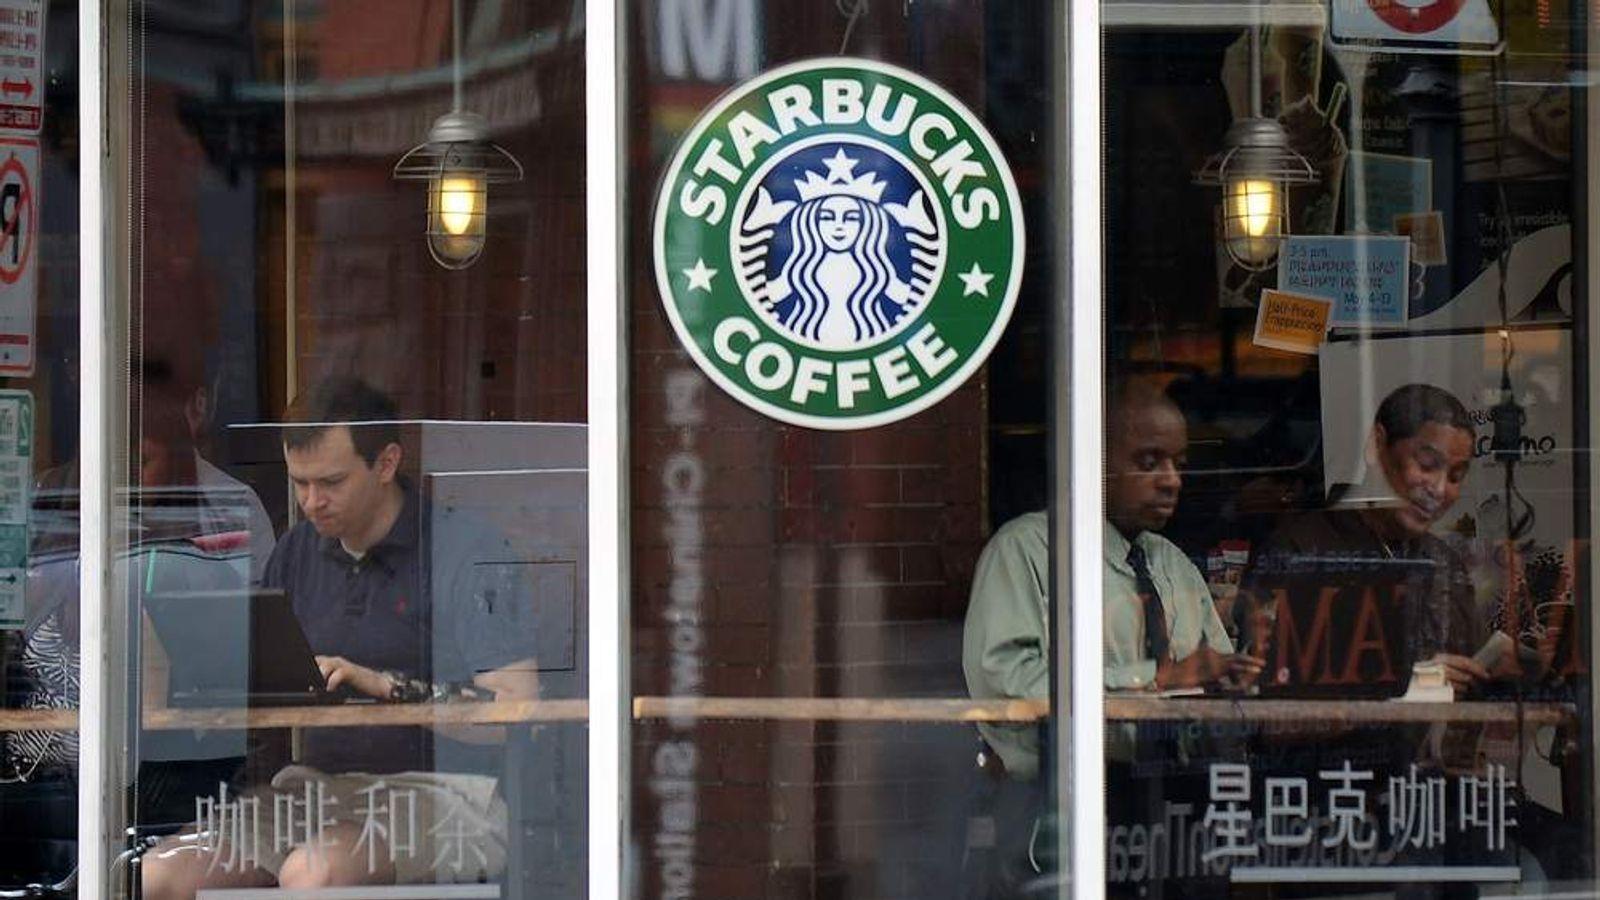 A Starbucks